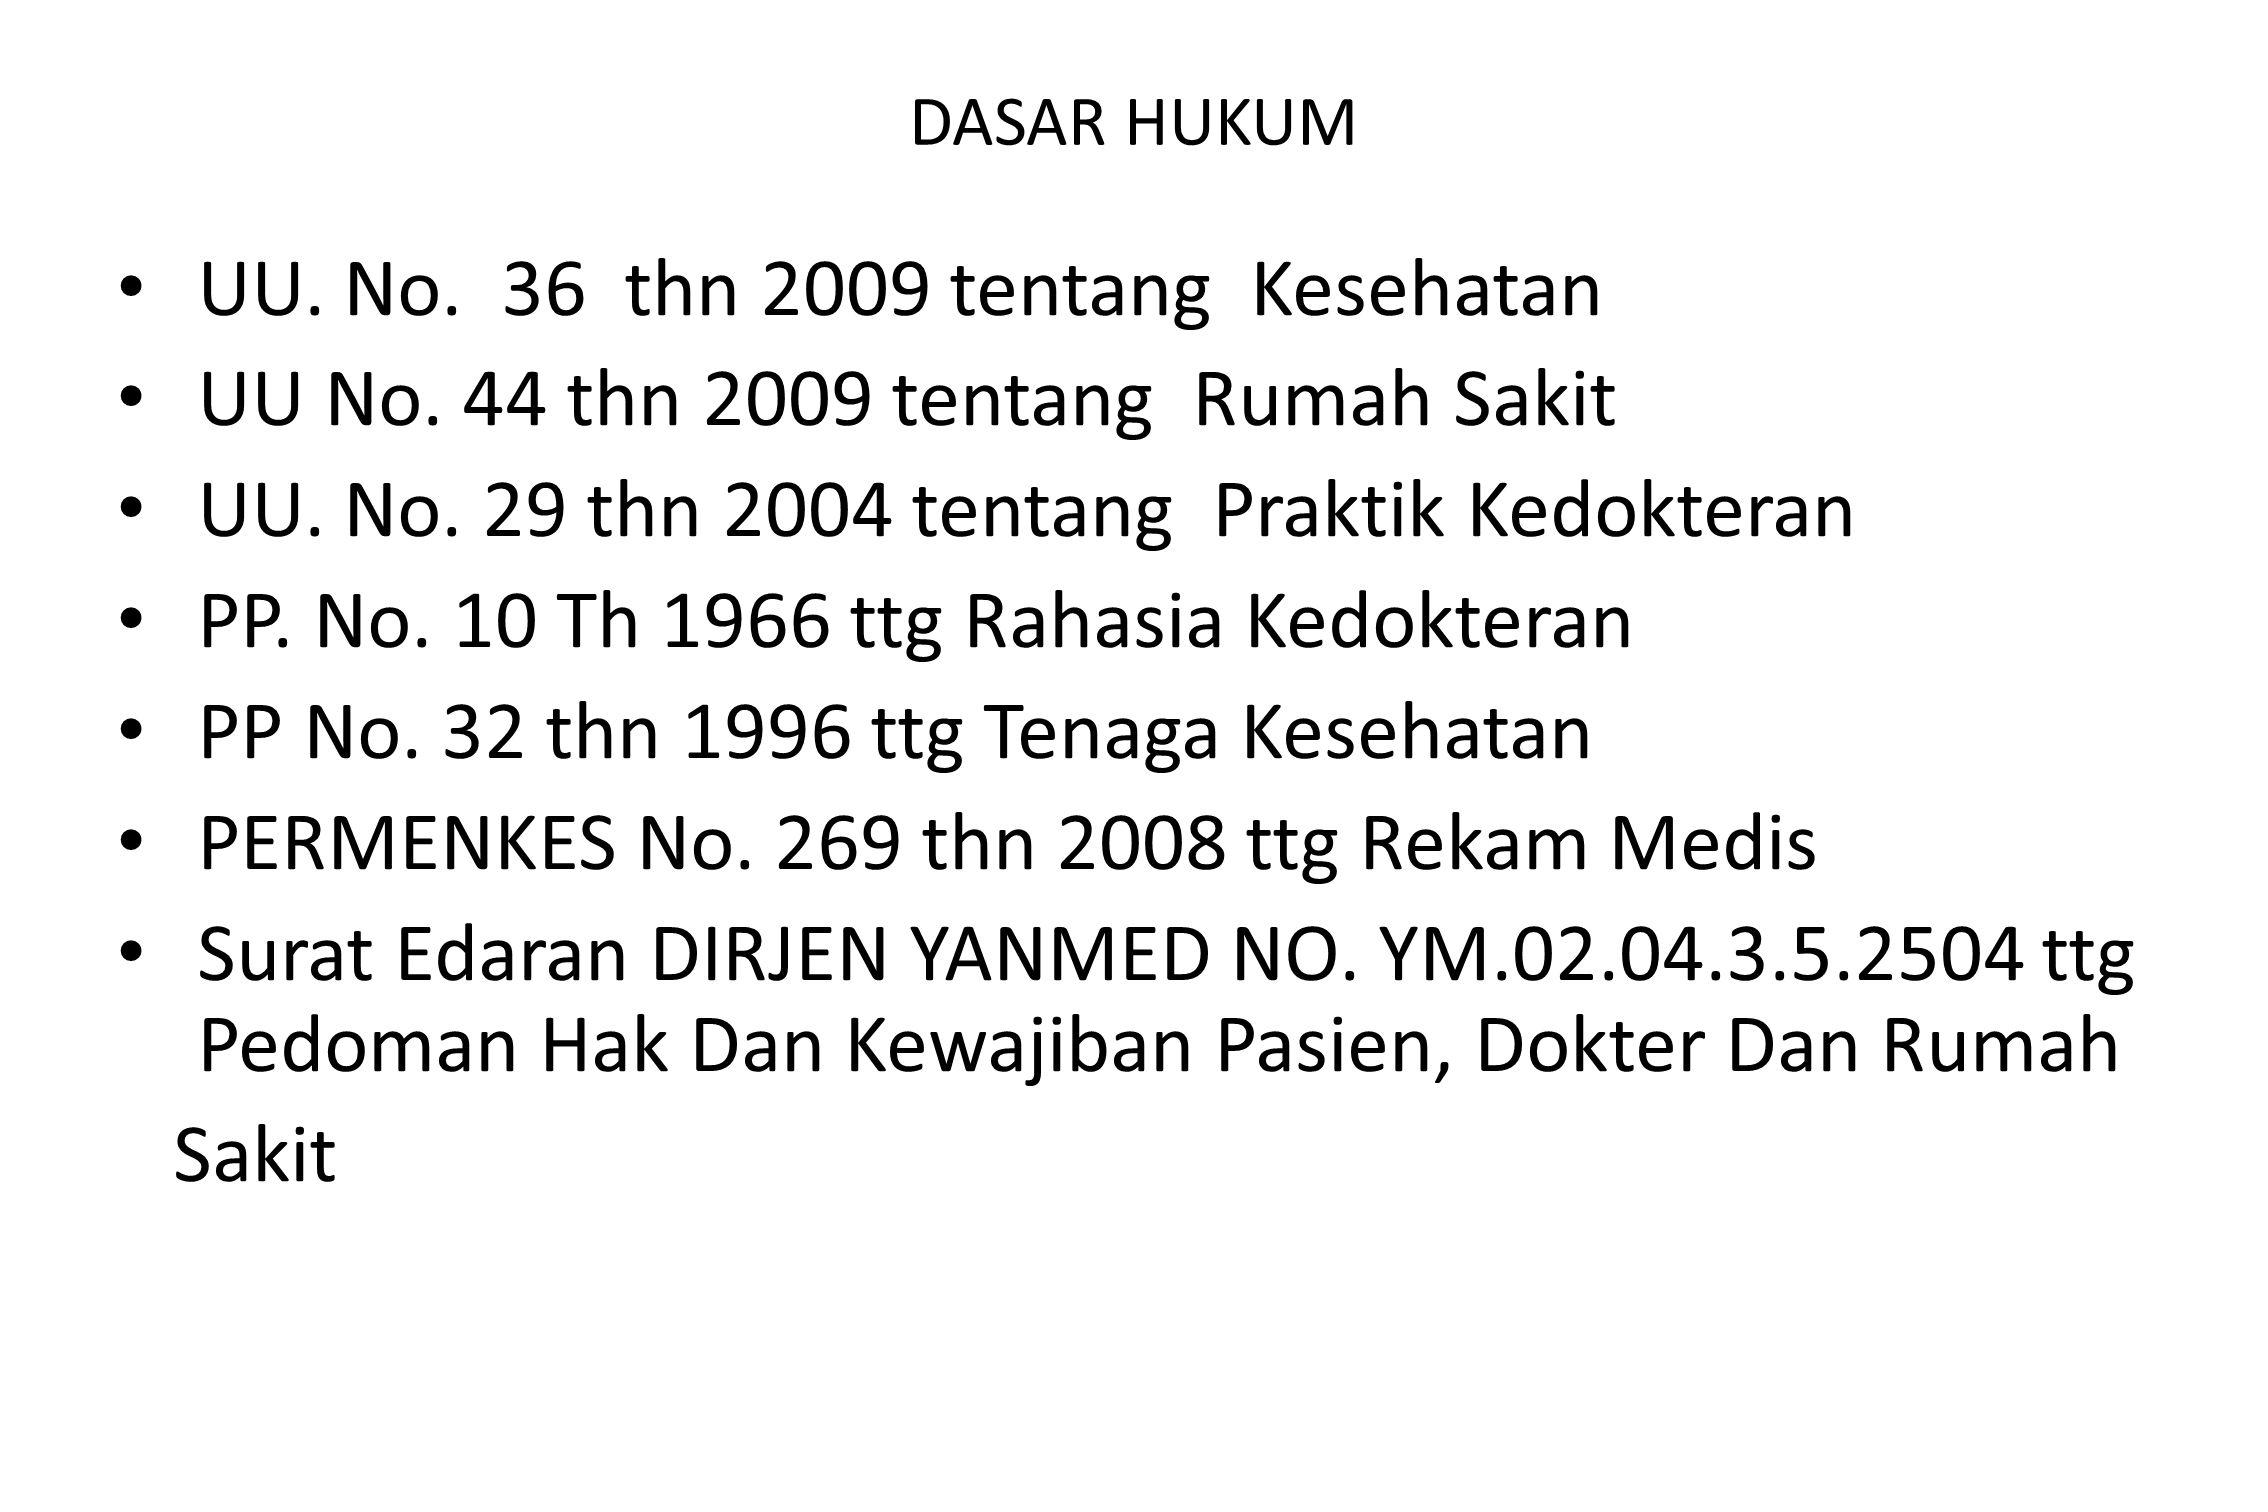 DASAR HUKUM UU. No. 36 thn 2009 tentang Kesehatan UU No. 44 thn 2009 tentang Rumah Sakit UU. No. 29 thn 2004 tentang Praktik Kedokteran PP. No. 10 Th